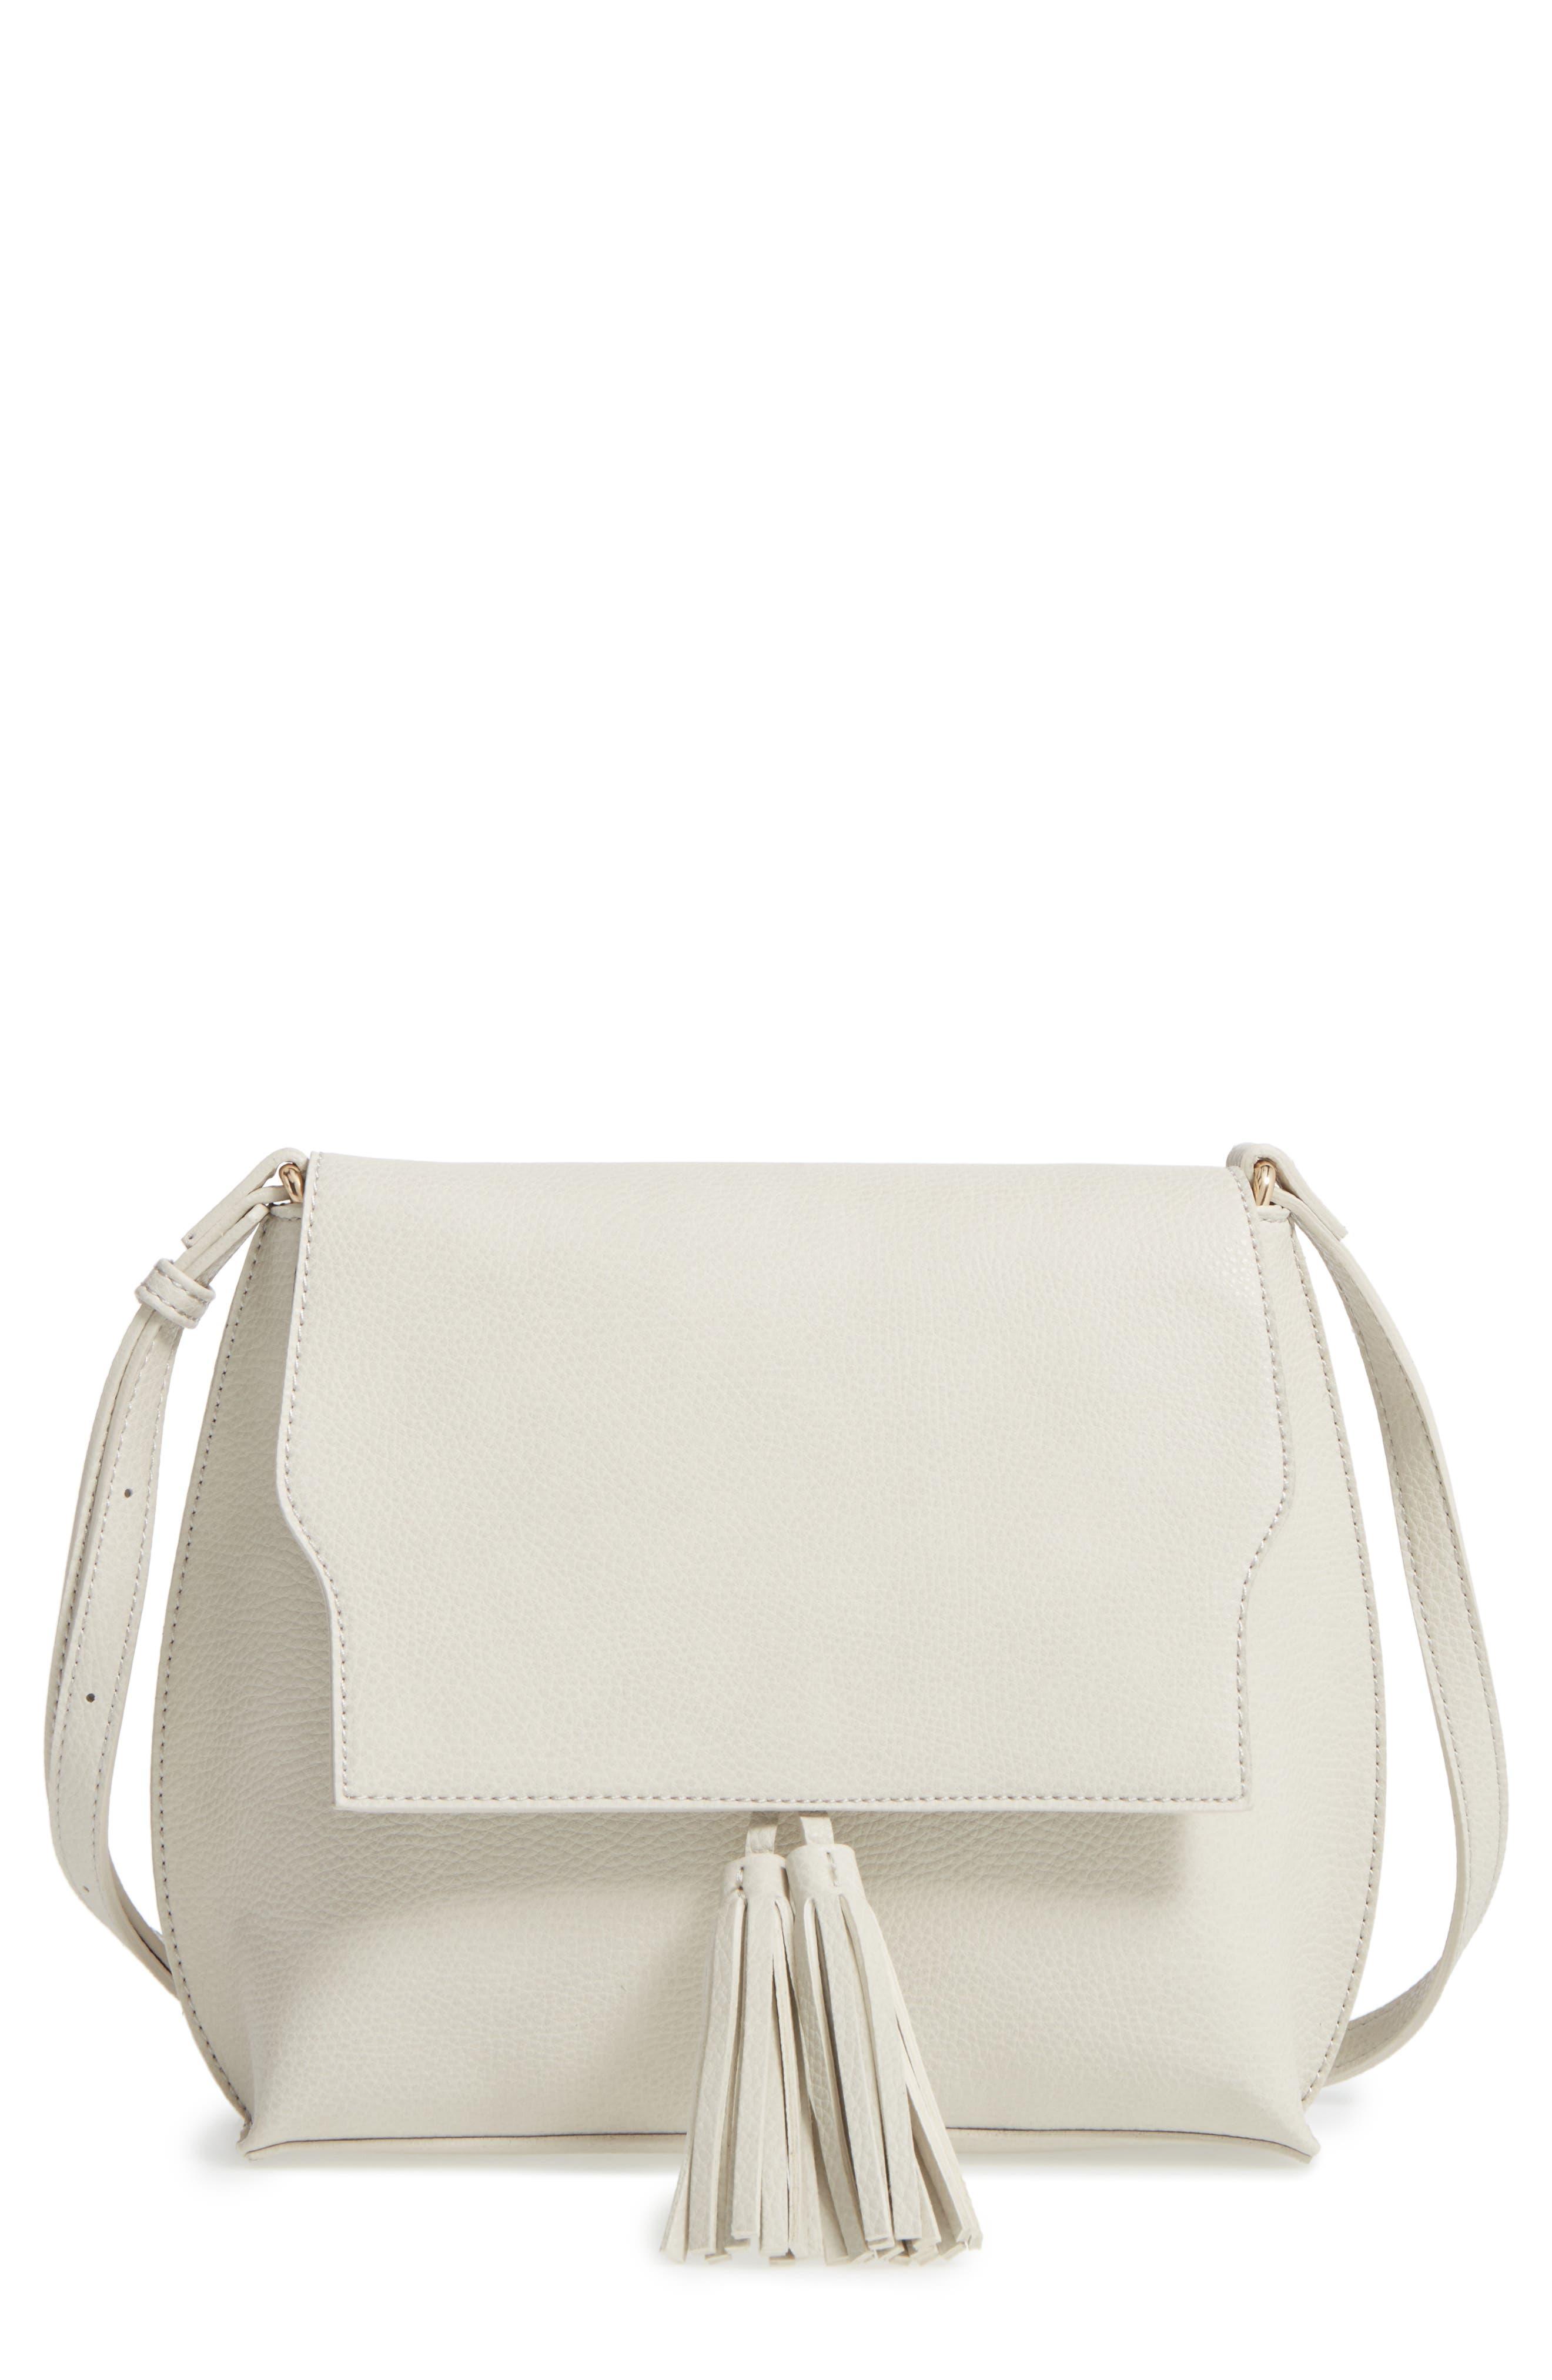 Sole Society Tassel Faux Leather Crossbody Bag